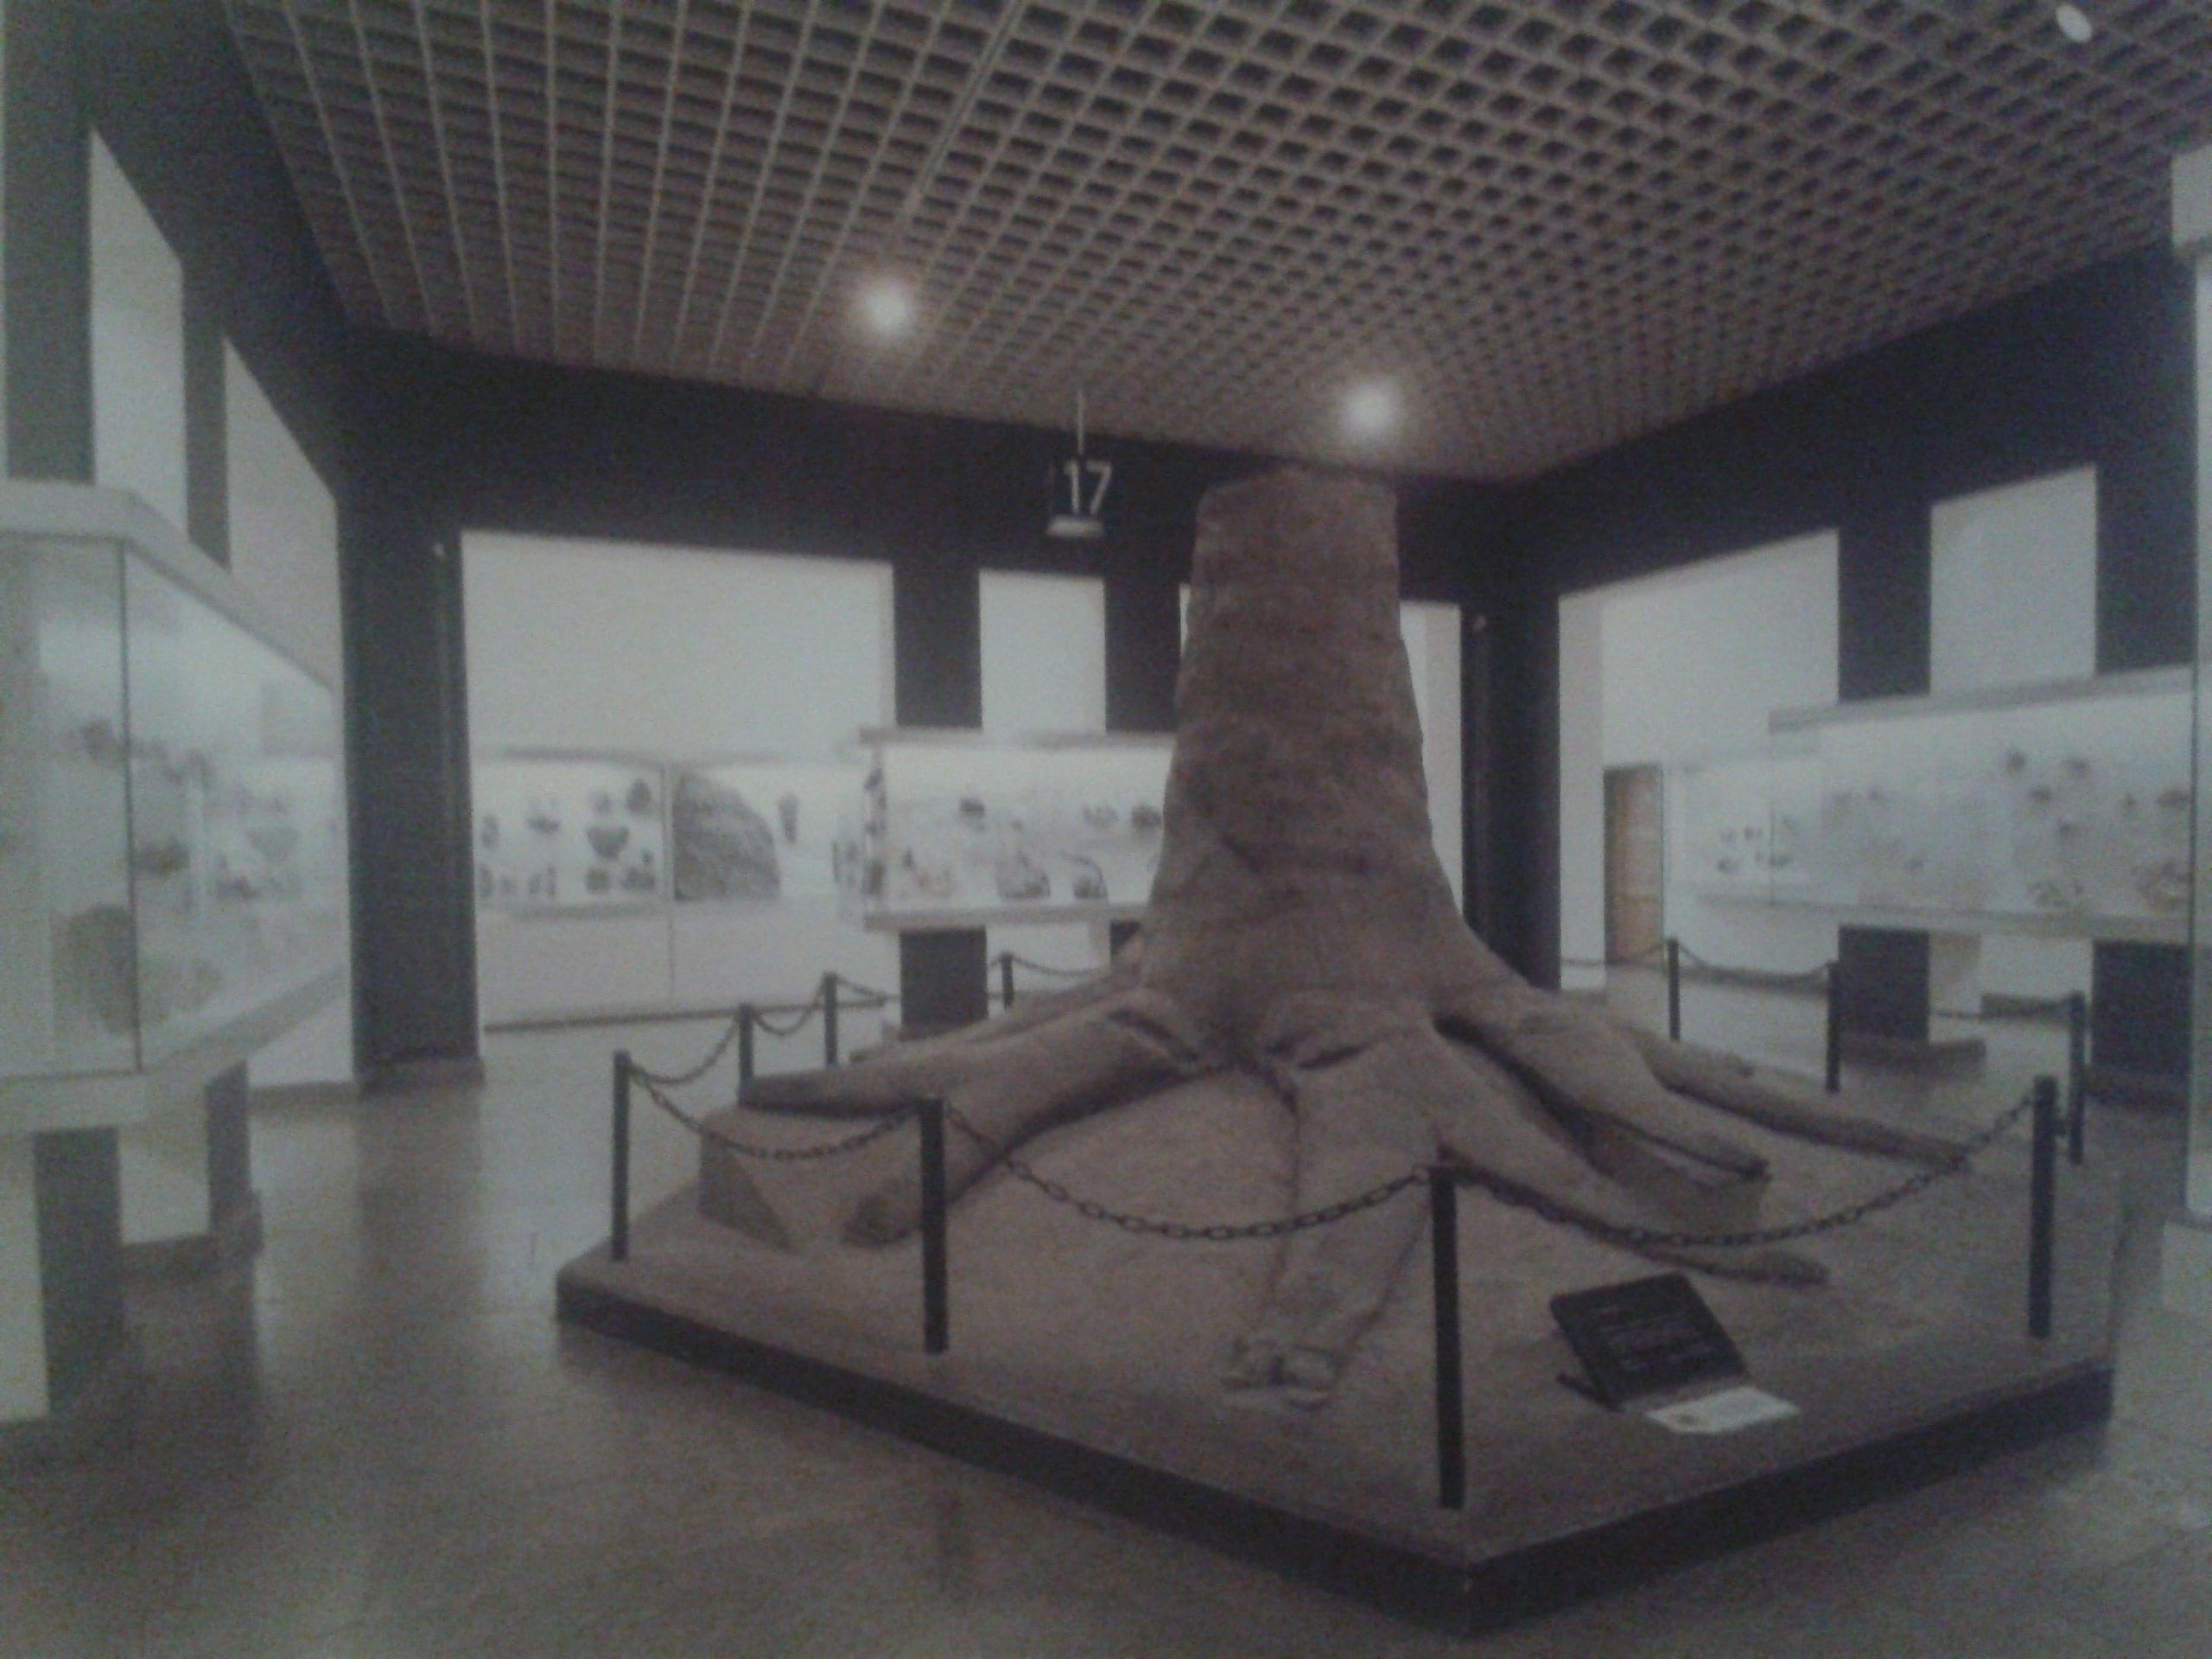 Fossielen & Dinosauriërs | Fossiele Boom vóór demontage | Bergbaumuseum Bochum, Duitsland